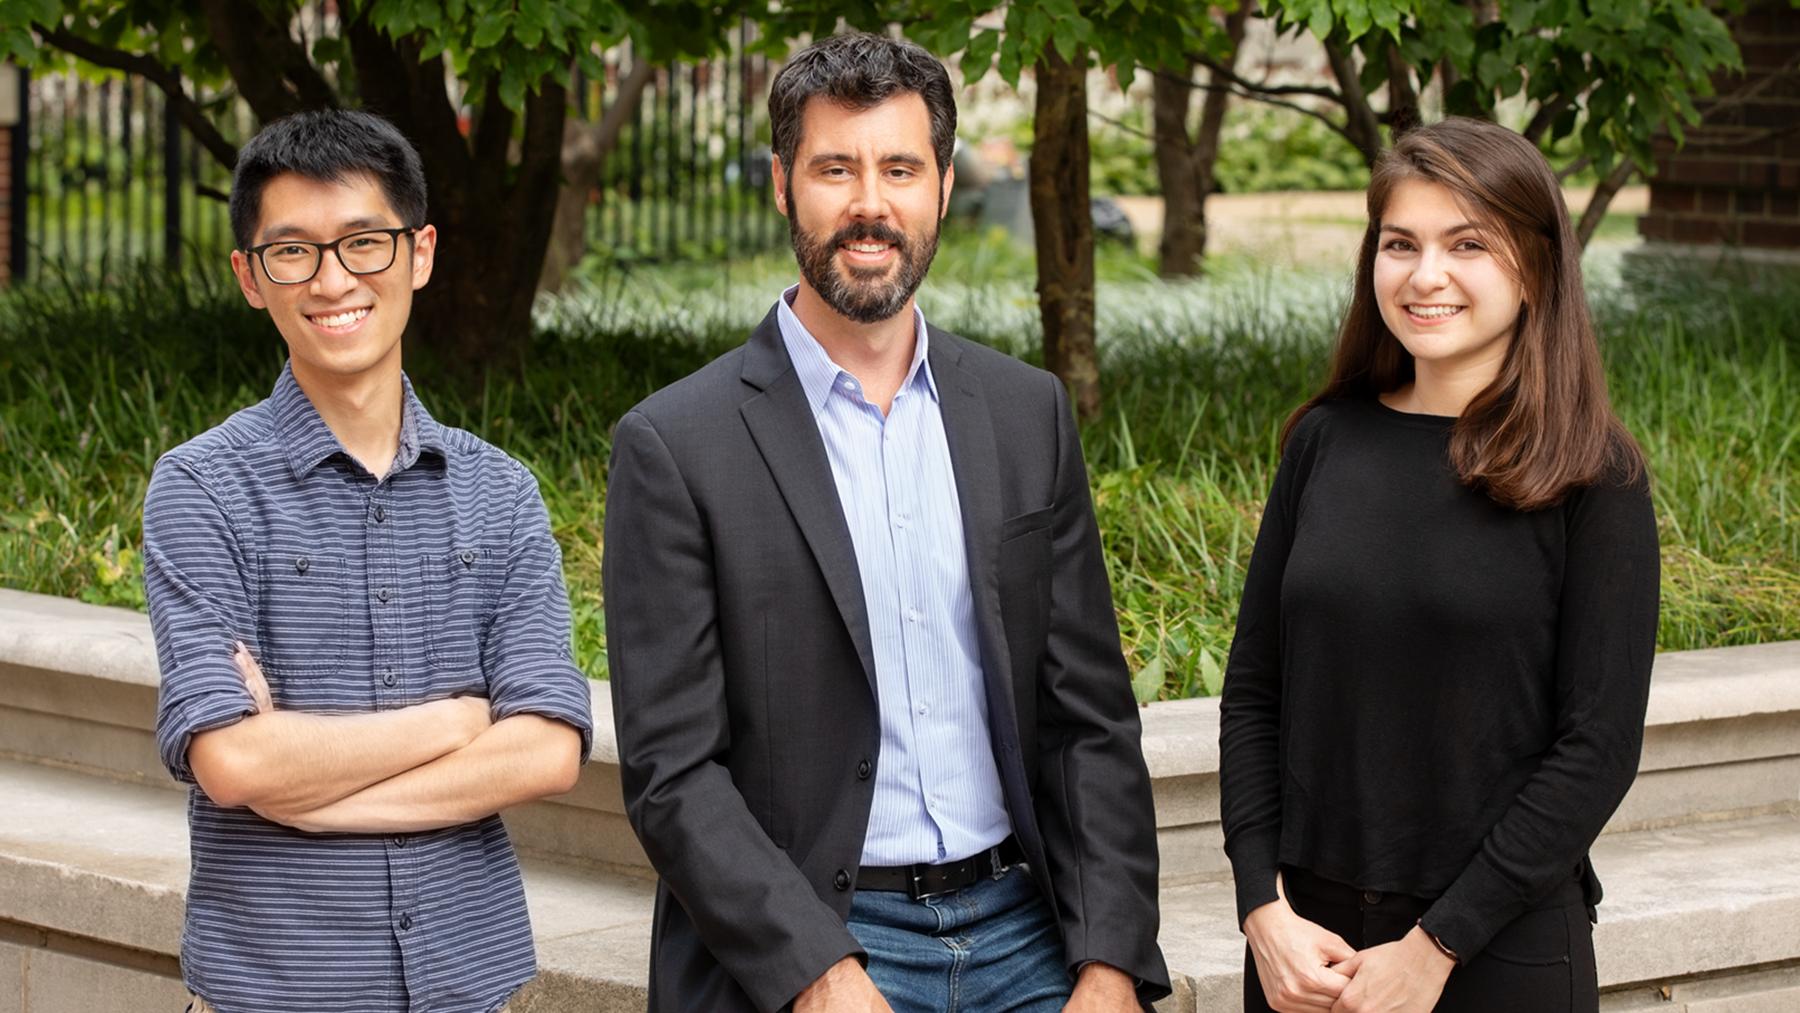 graduate student Matthew Chan, professor David Flaherty and graduate student Zeynep Ayla. Photo by Brian Stauffer